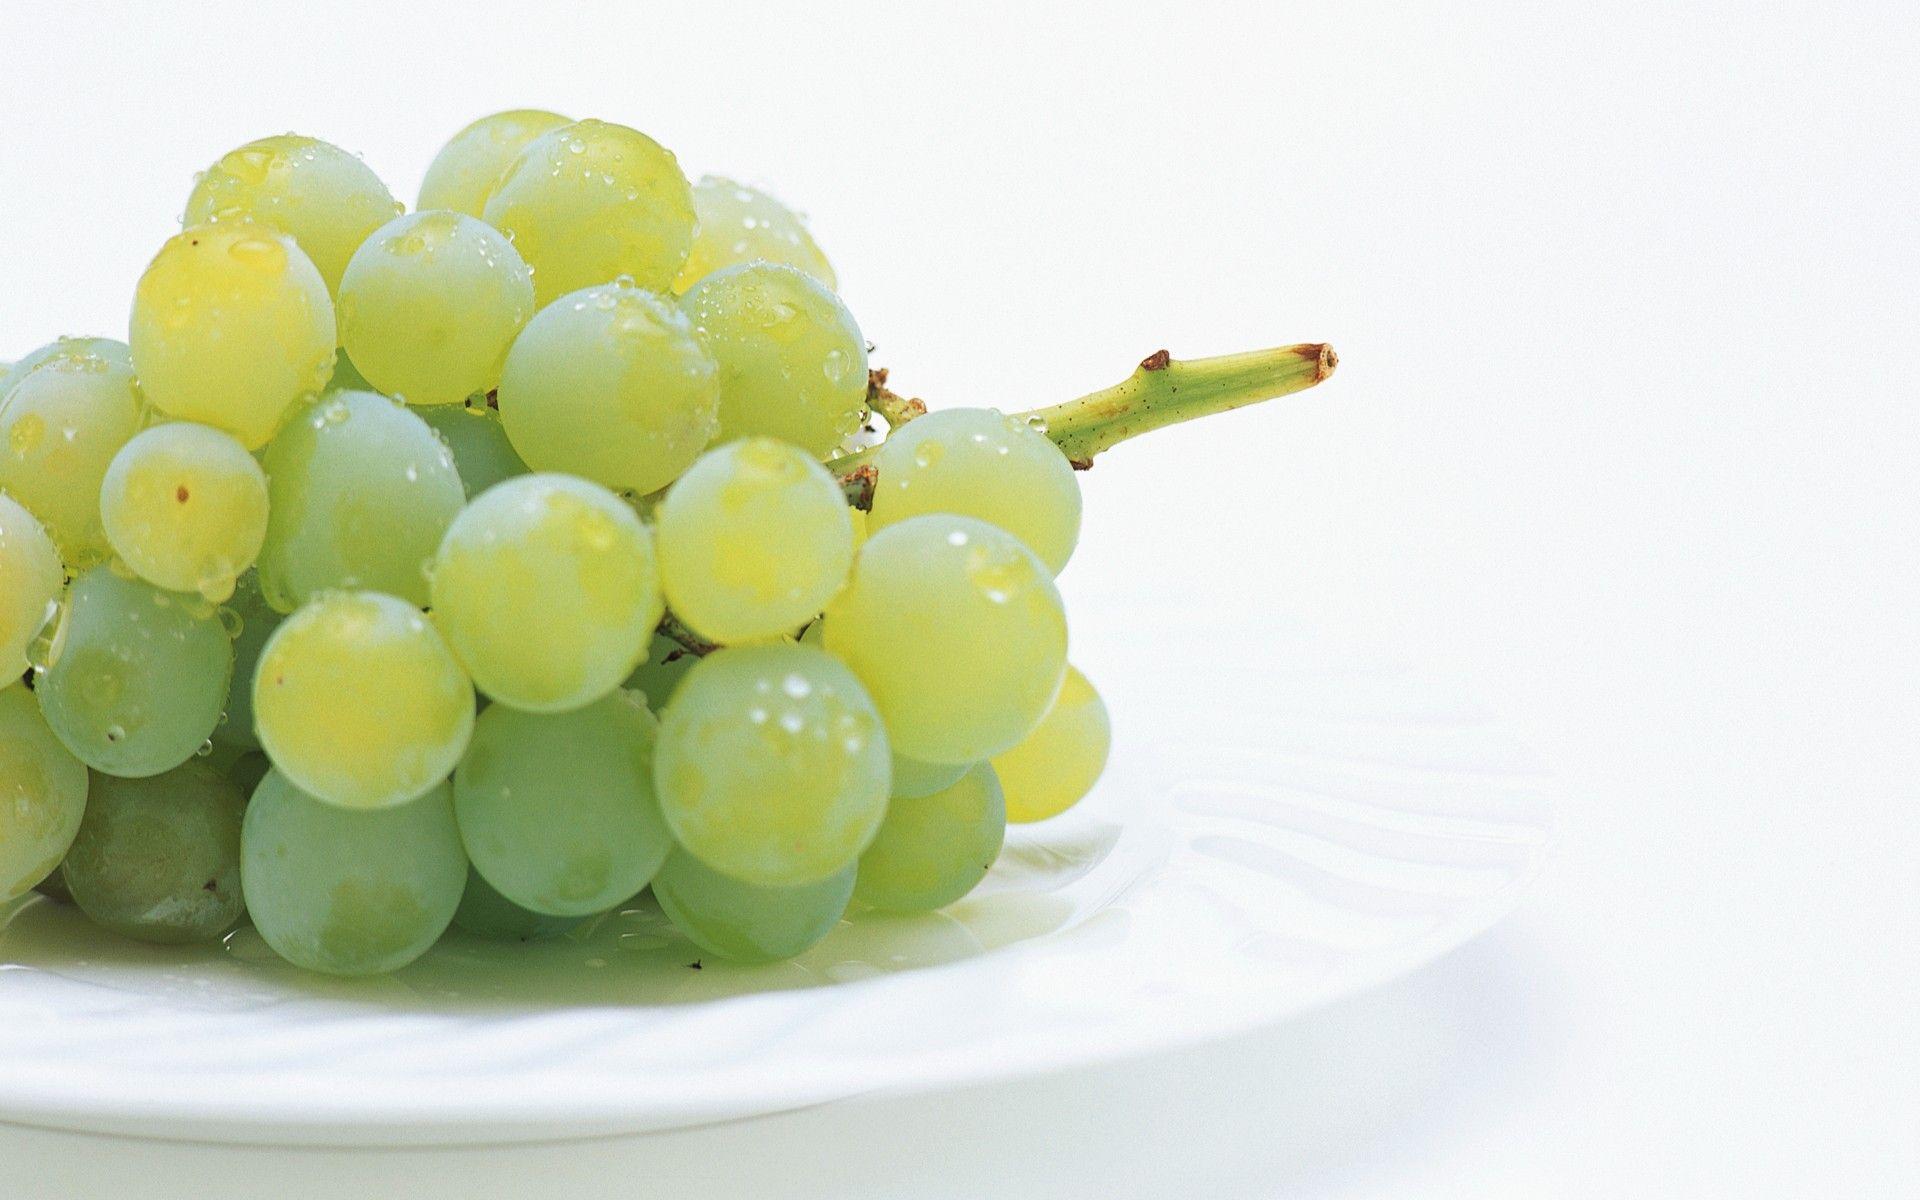 Wallpaper fruits free download - Grapes Hd Wallpaper Free Download For Desktop